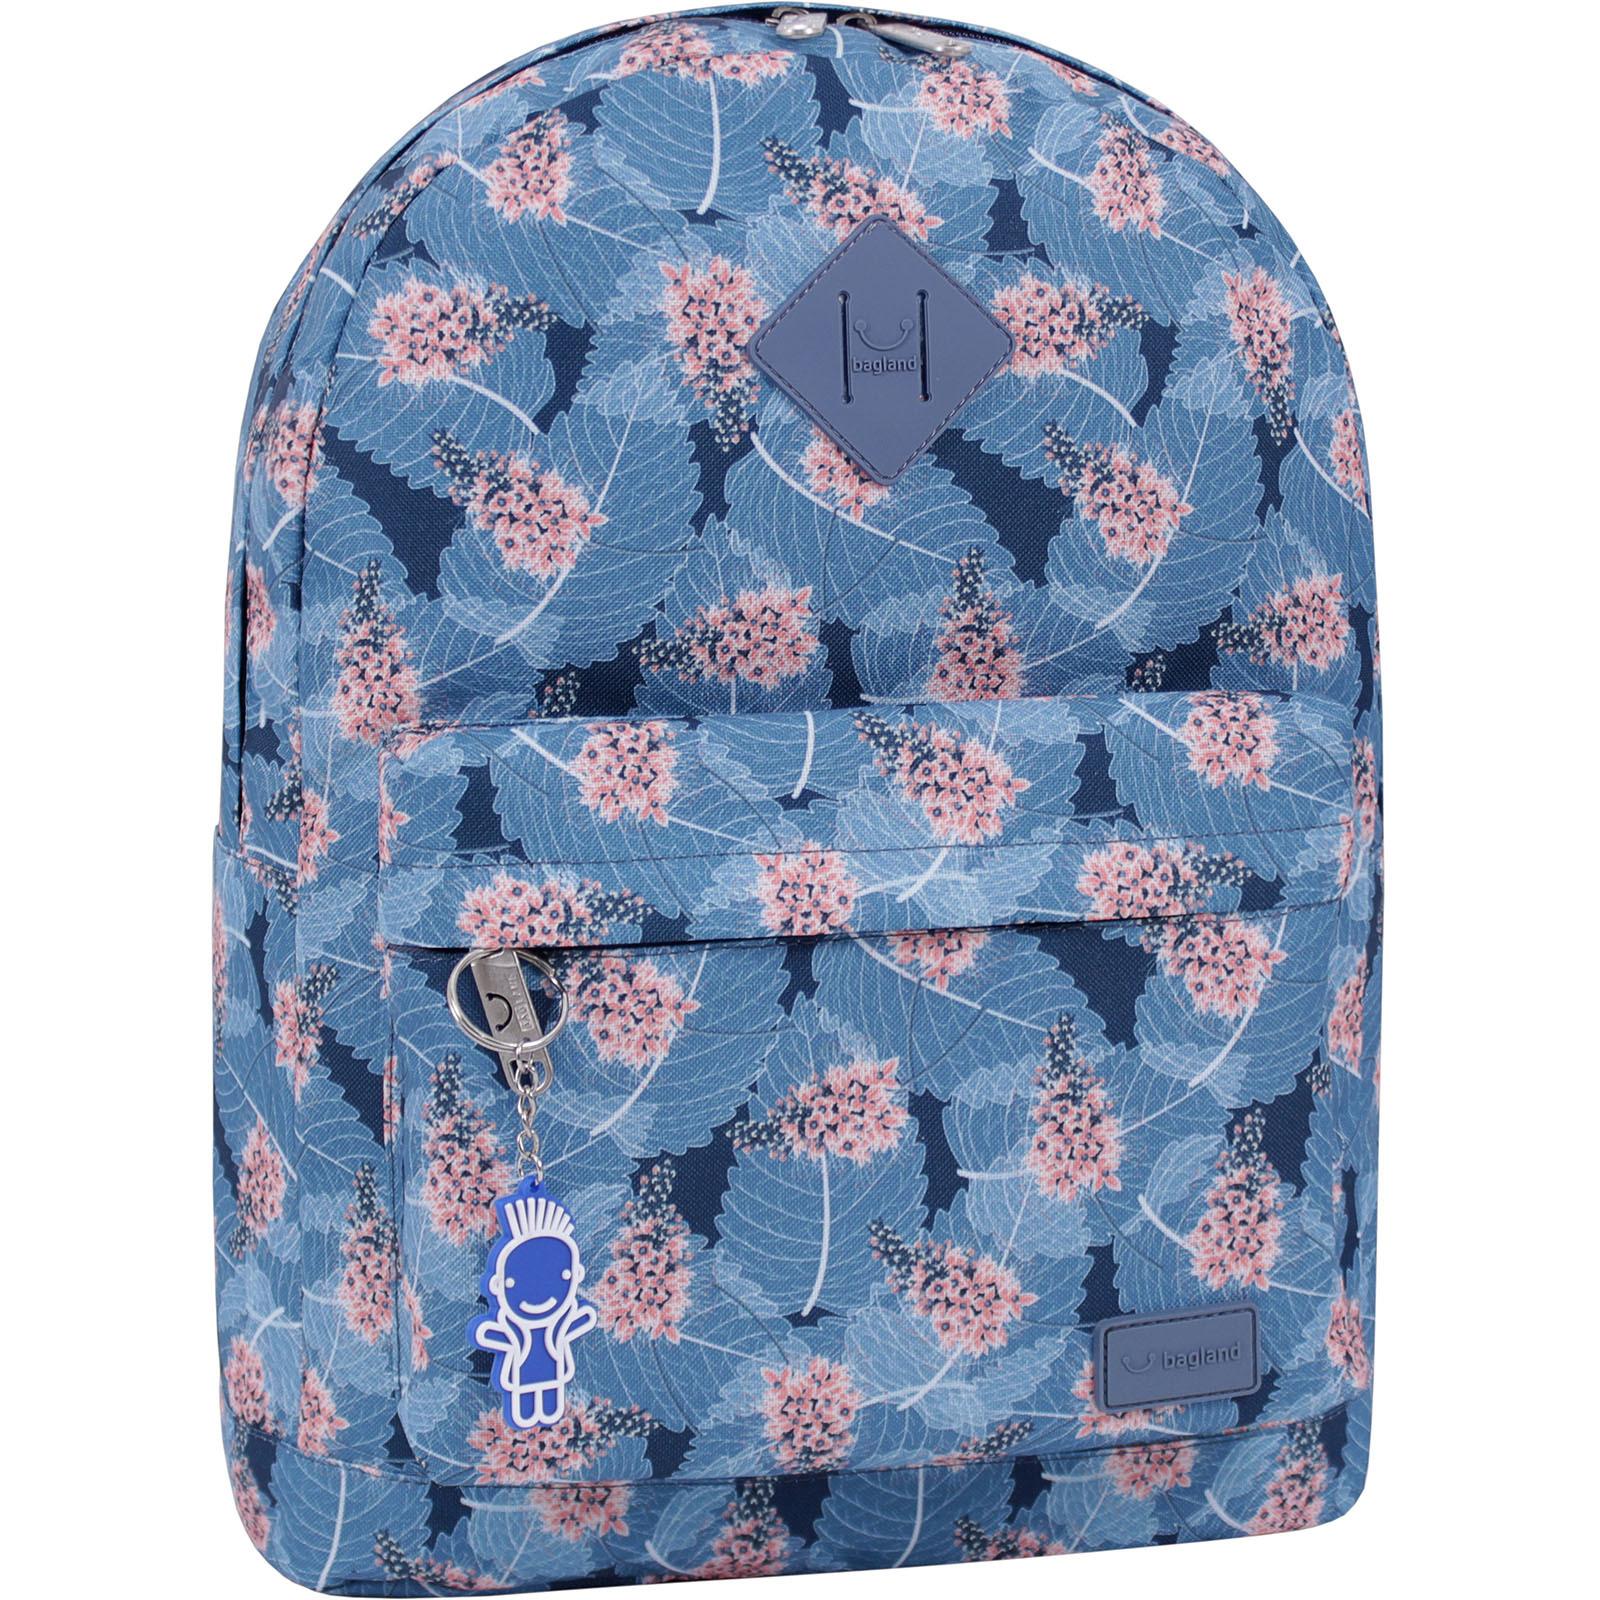 Городские рюкзаки Рюкзак Bagland Молодежный 17 л. сублимация 479 (00533664) IMG_9473_суб.479_.JPG